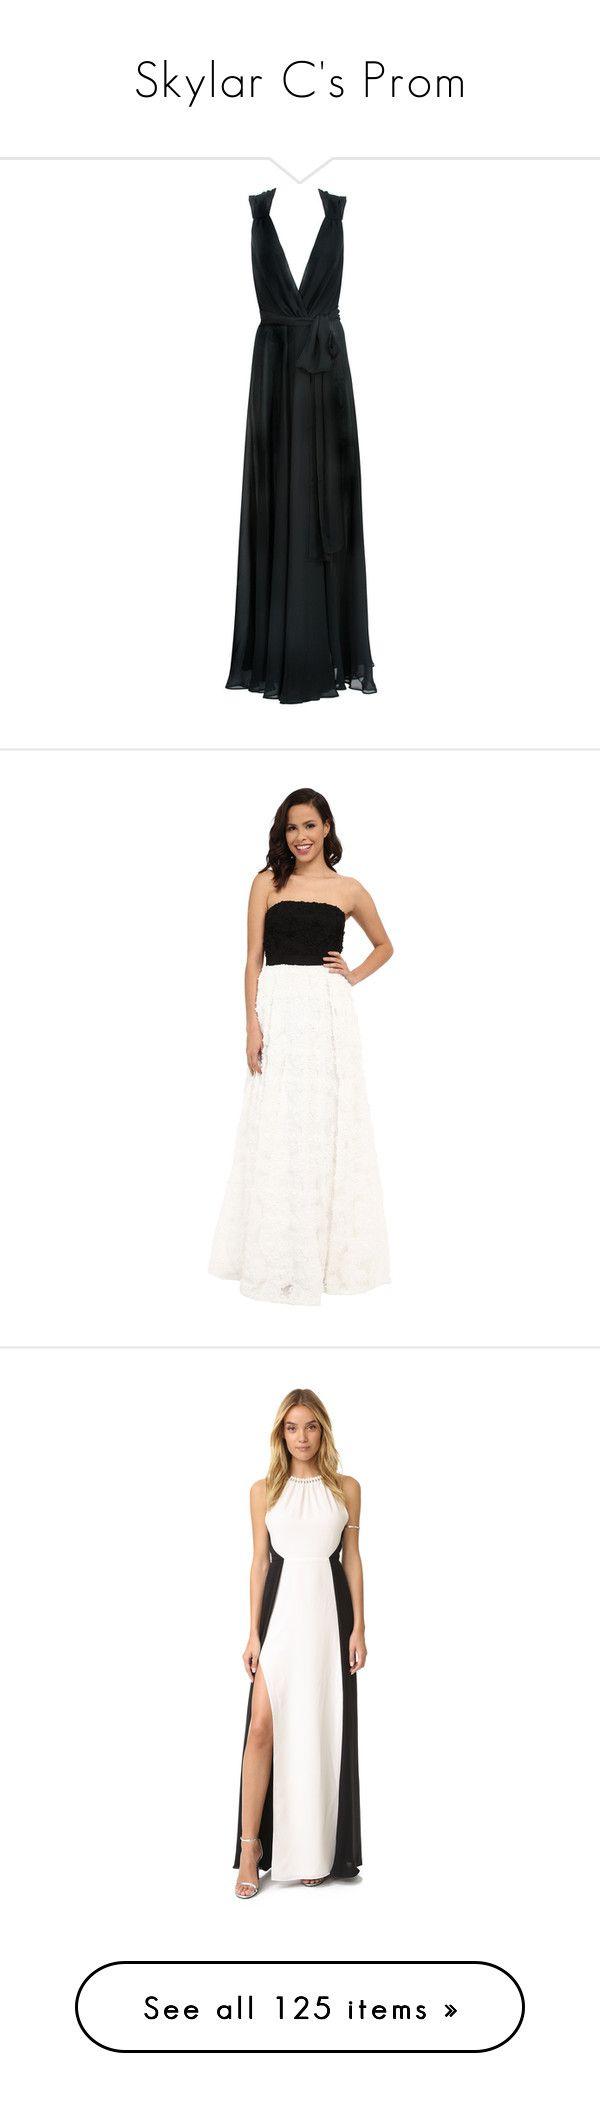 """Skylar C's Prom"" by taryn-scott ❤ liked on Polyvore featuring dresses, drape dress, hooded dress, drapey dress, beach dresses, chiffon beach dress, gowns, black, chiffon evening dresses and full tulle skirt"